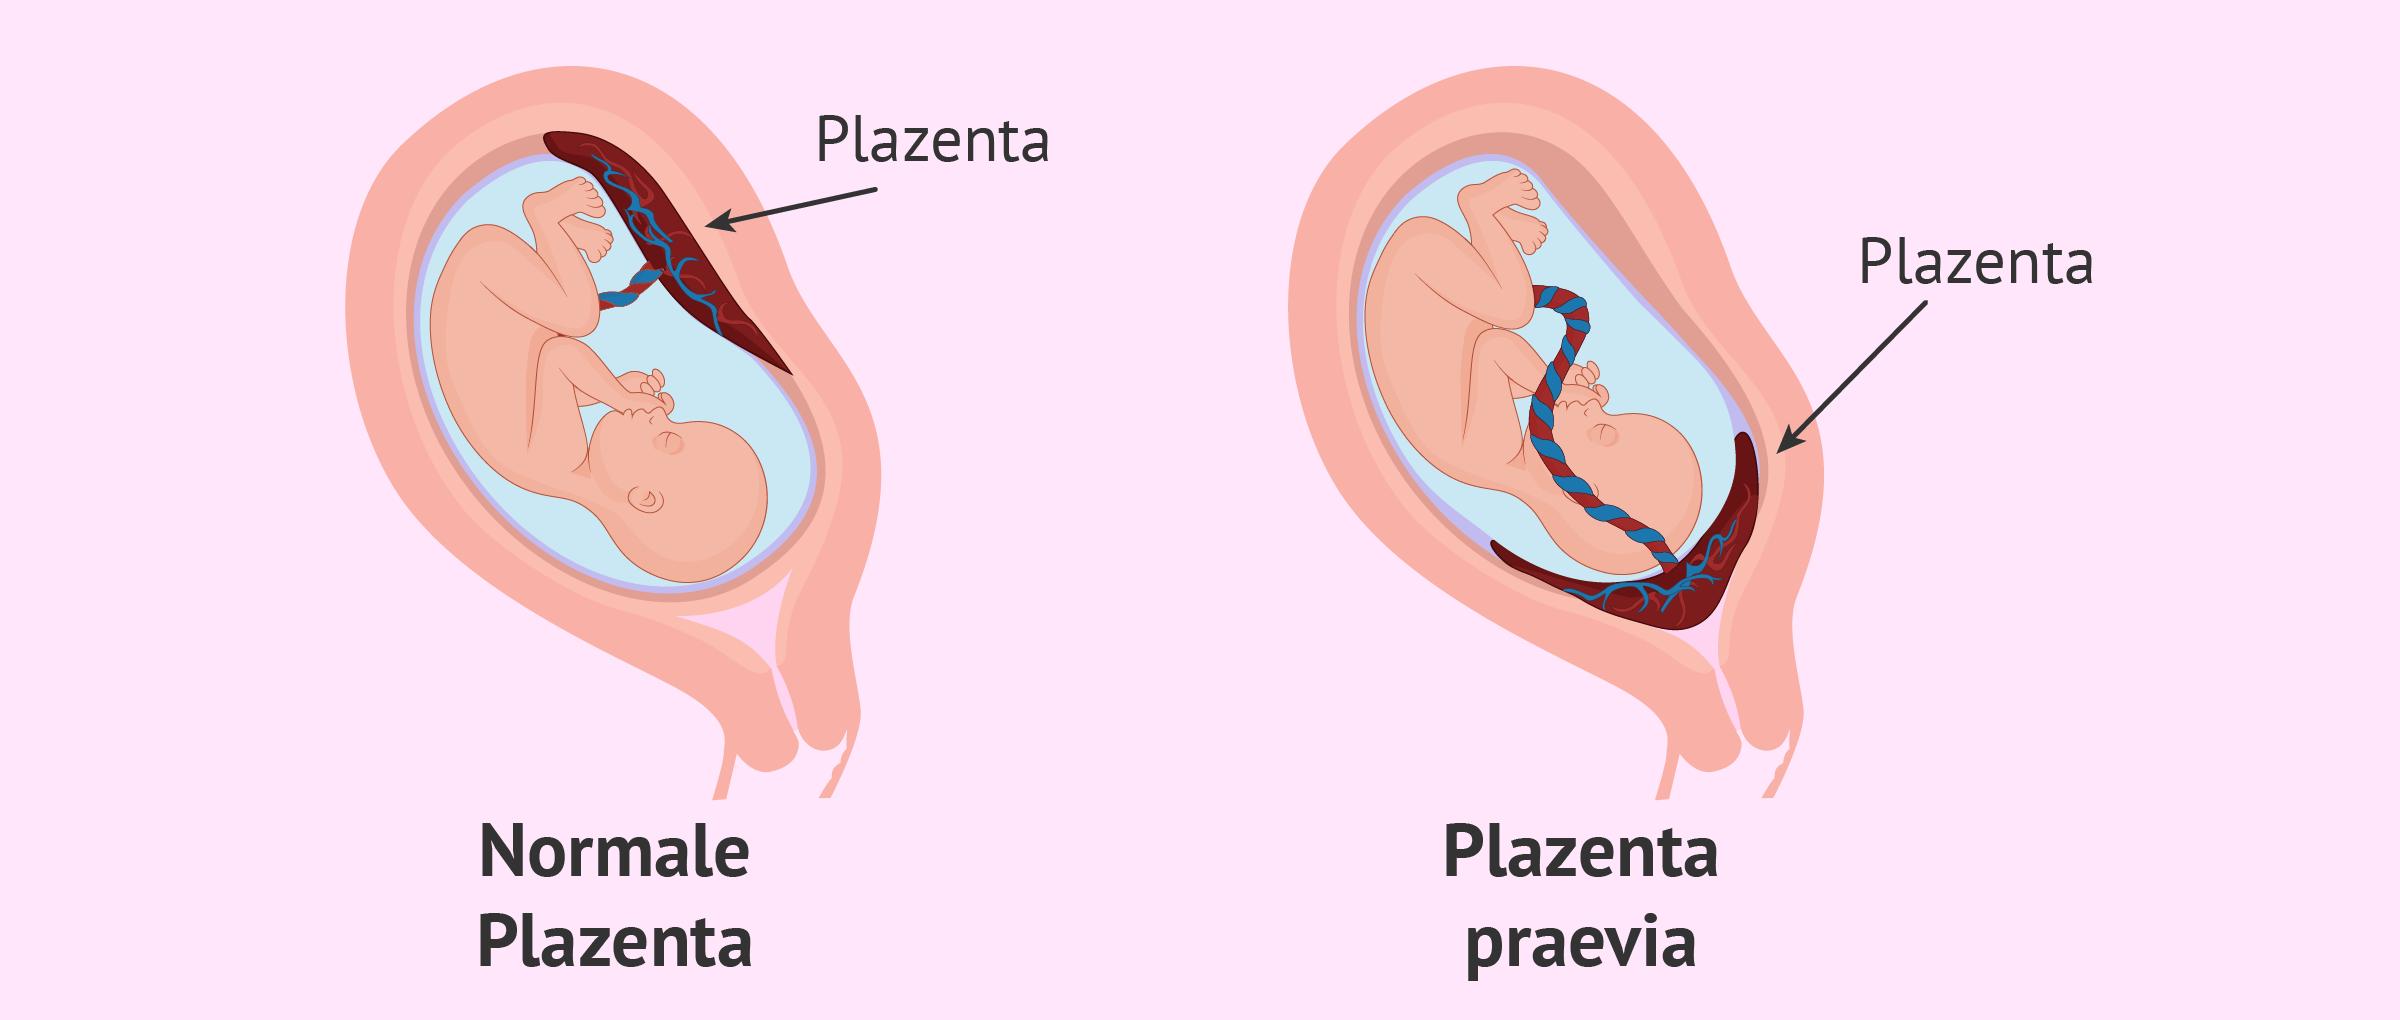 Plazenta Praevia Beschäftigungsverbot